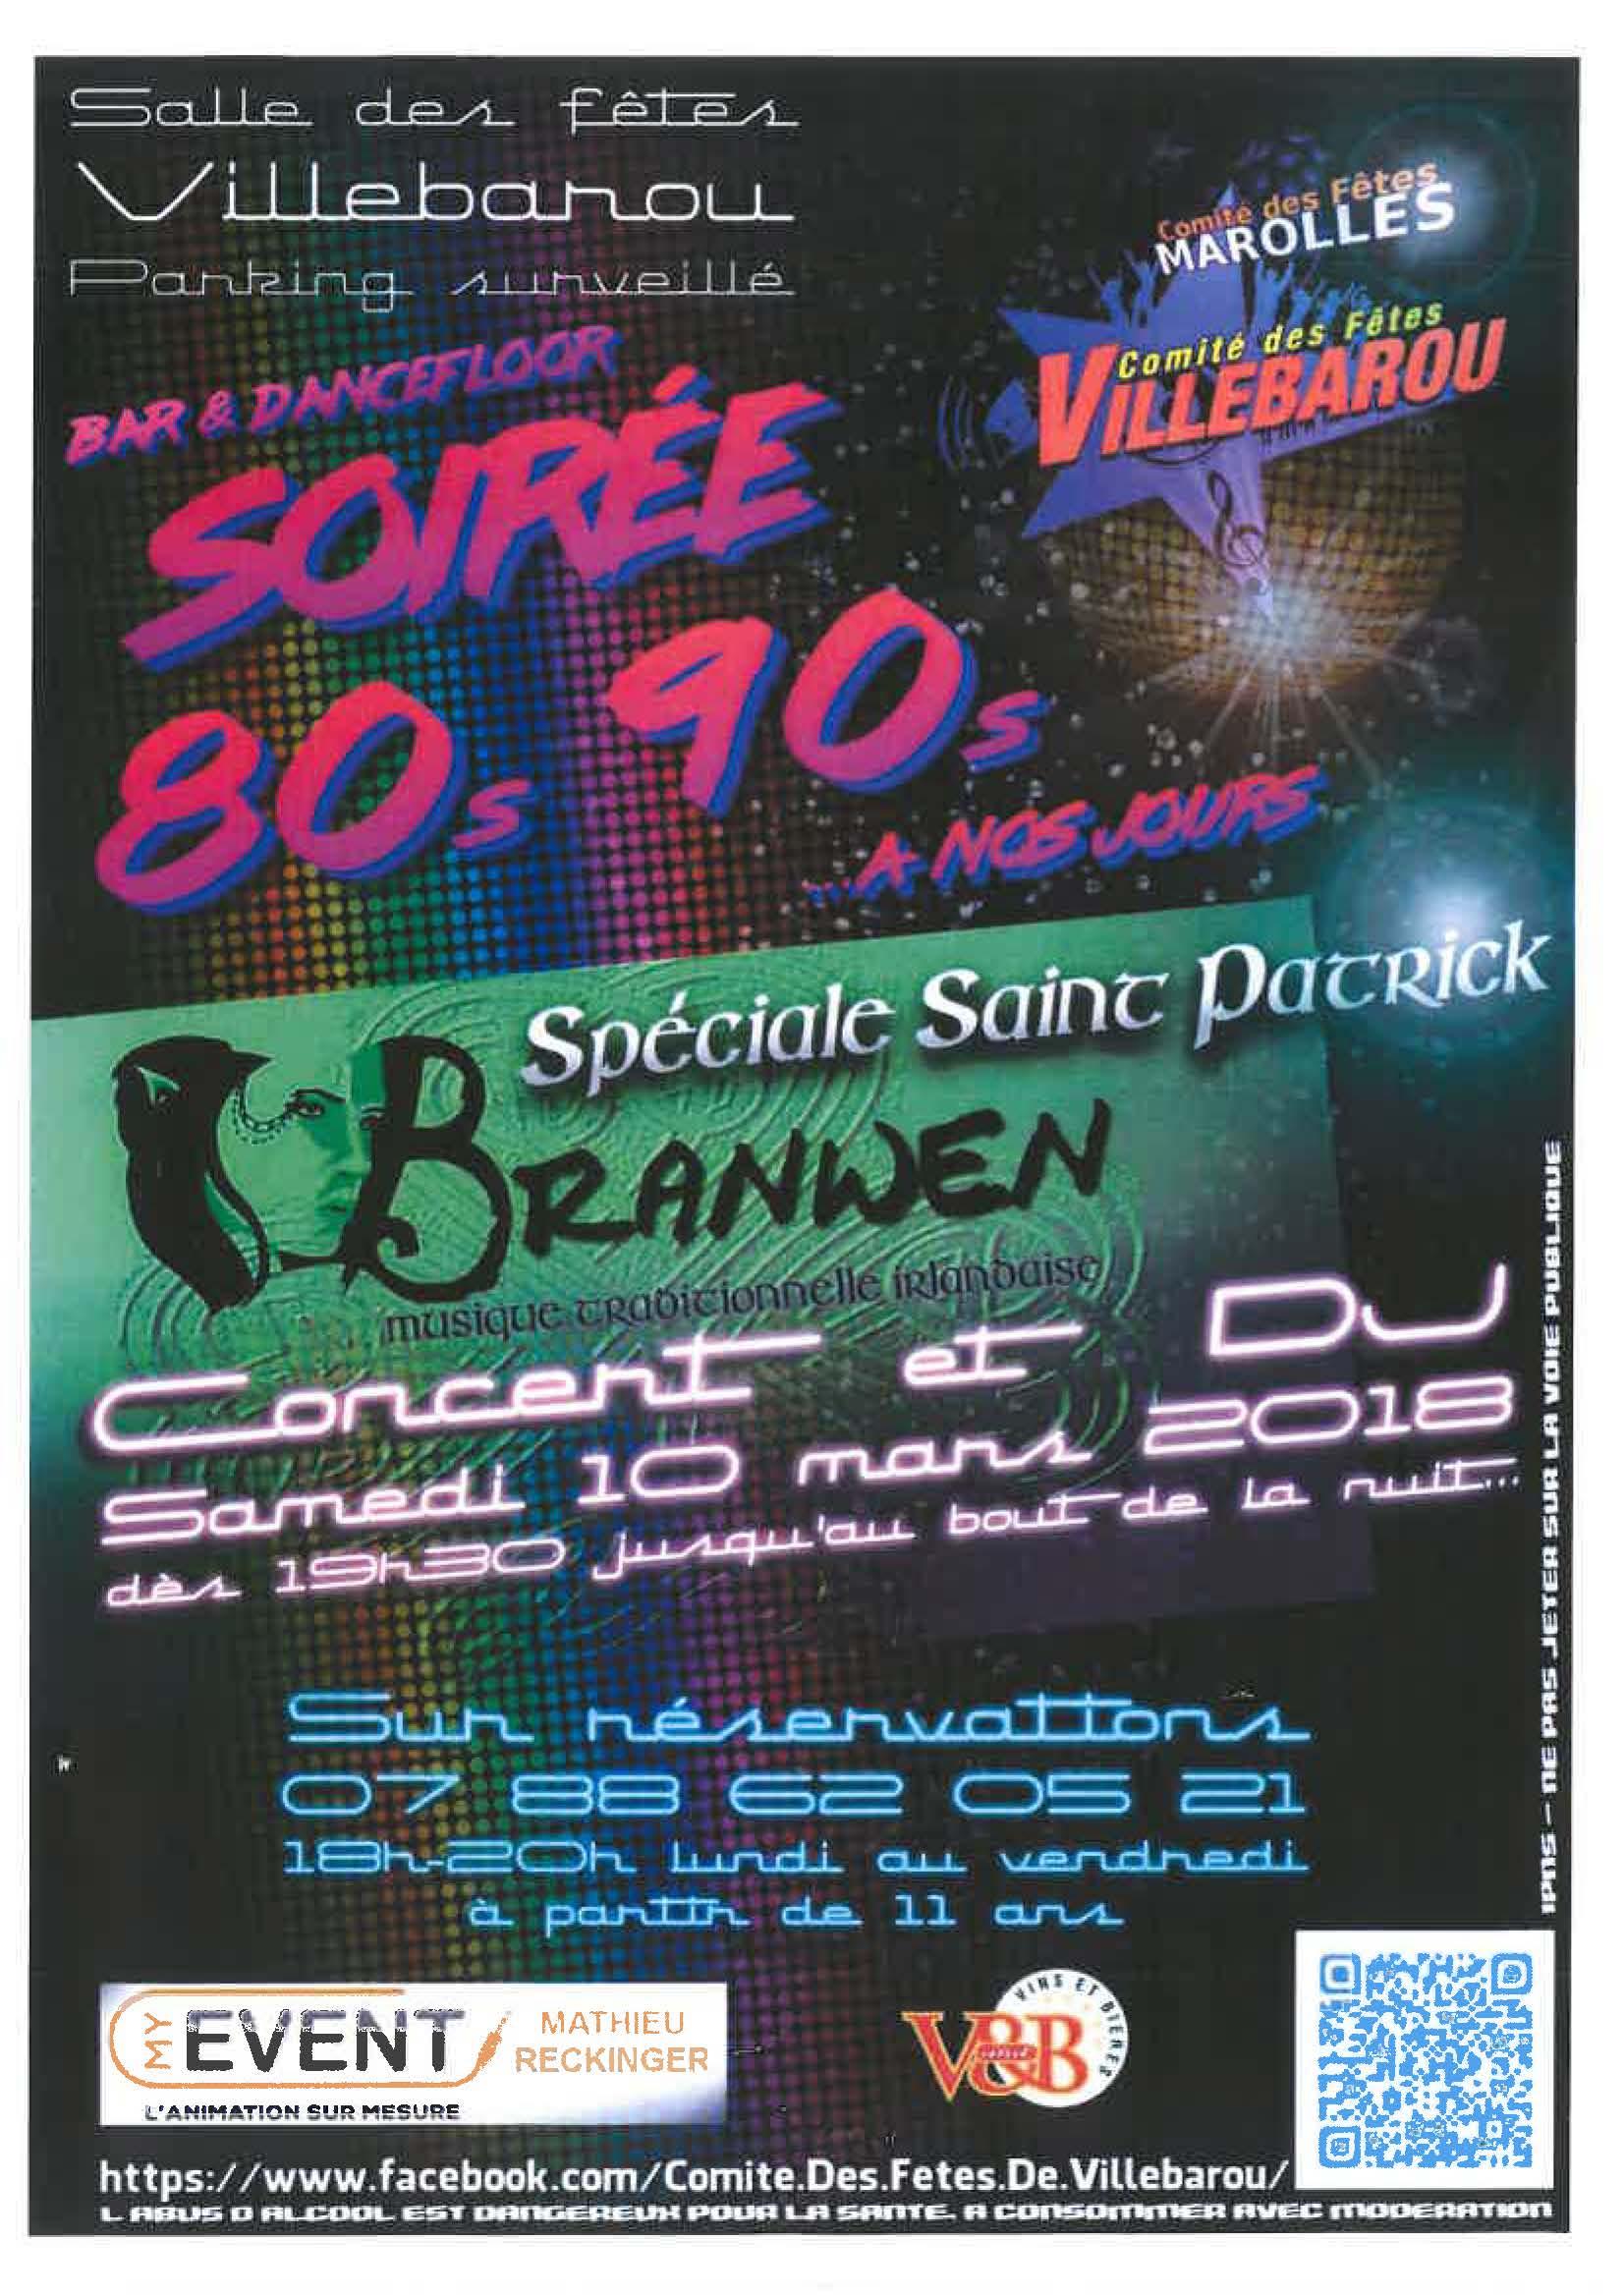 CFV - Soirée 80s -90s